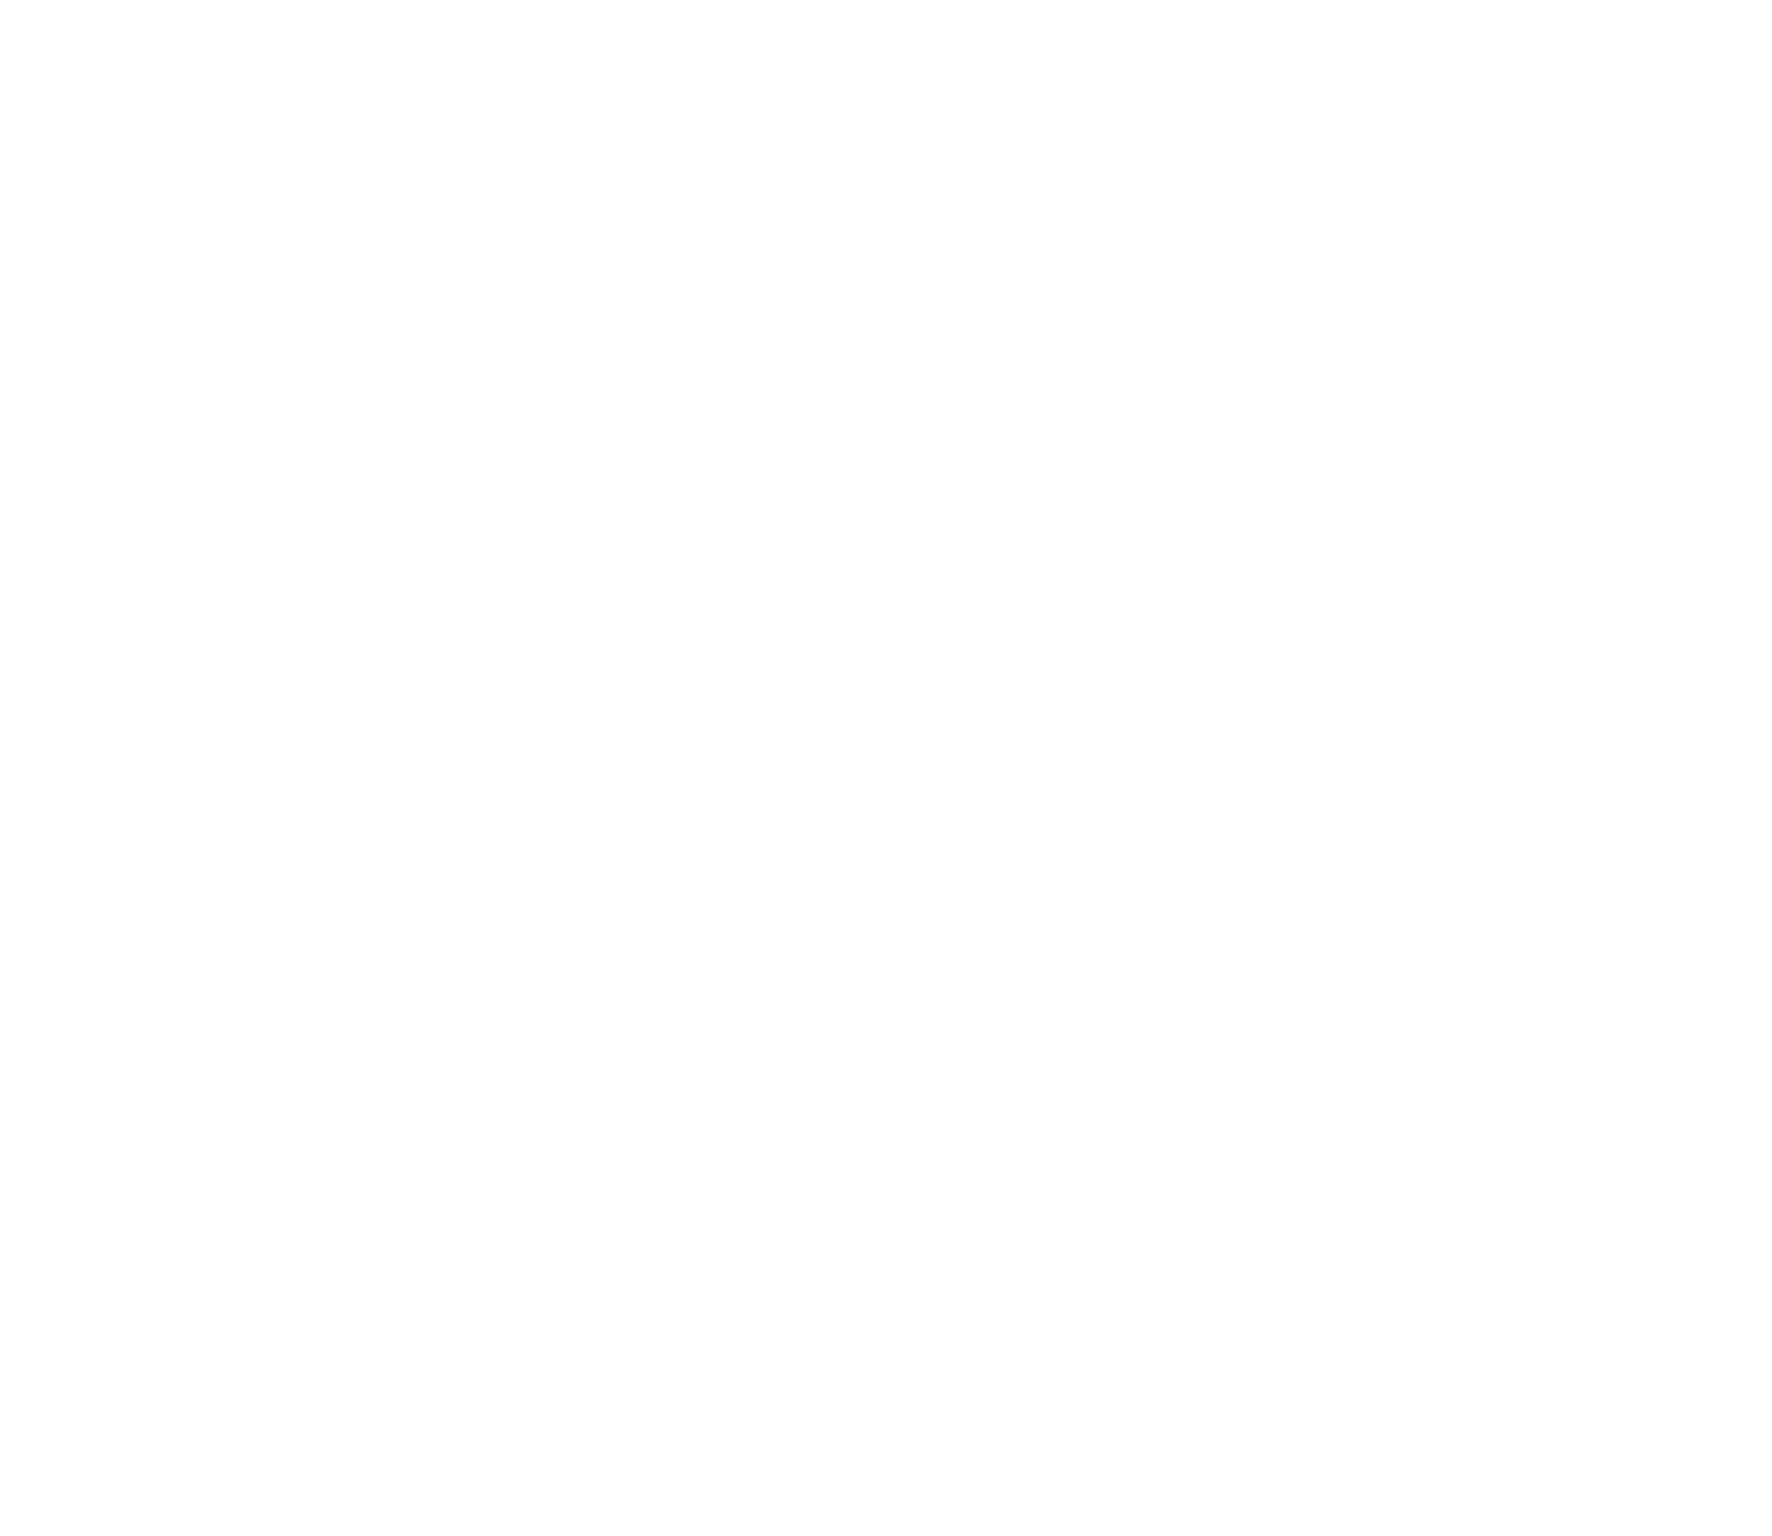 MotorverzekeringKeerman Logo wit